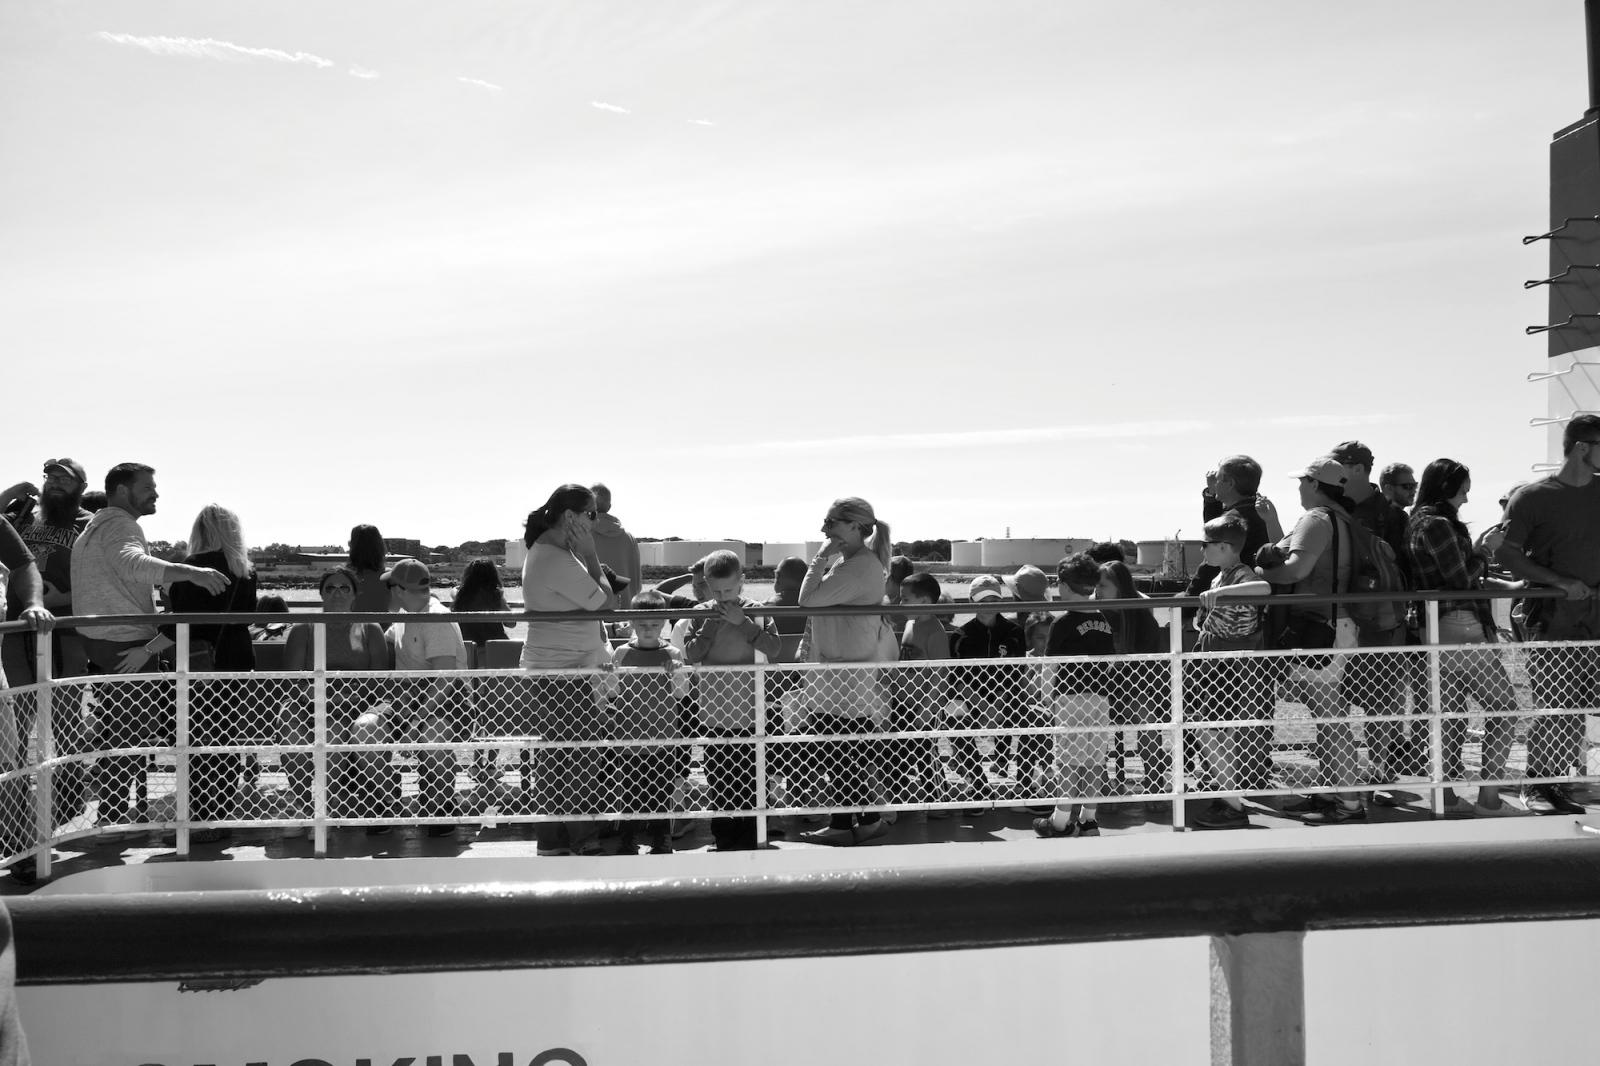 Art and Documentary Photography - Loading boatpeopleBandw_copy.jpg